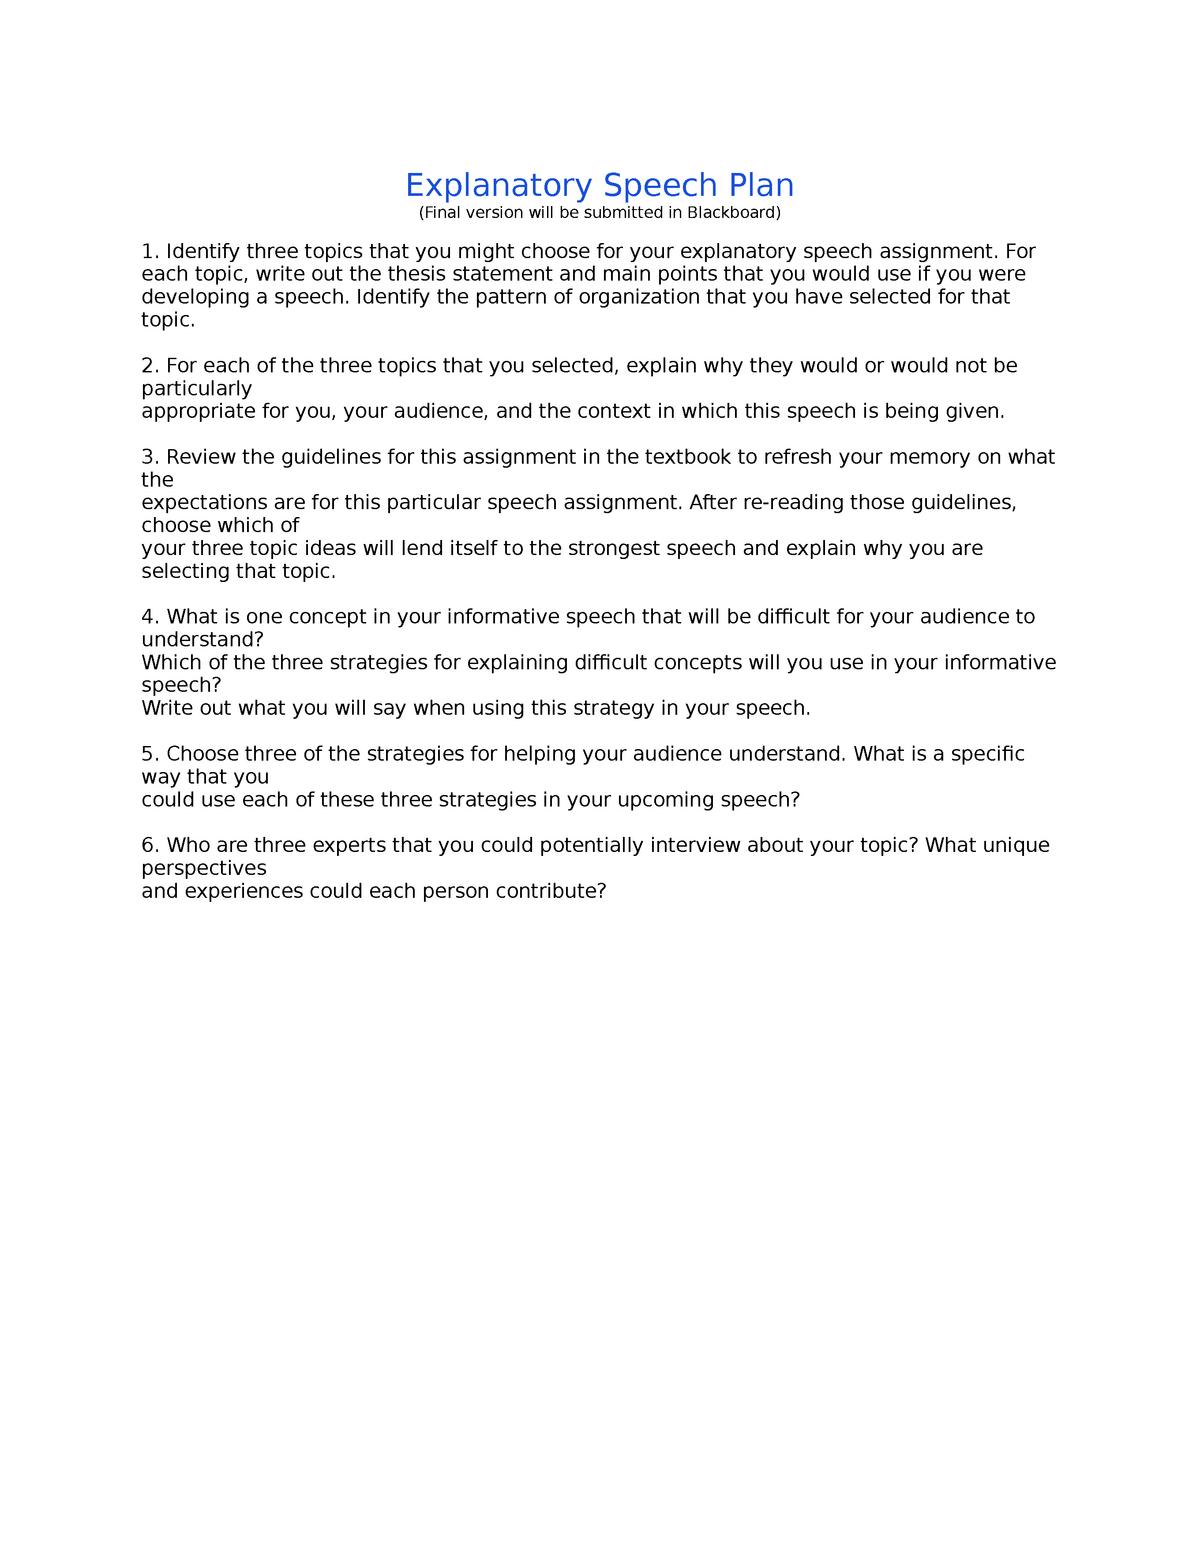 Explanatory Speech Plan - COMM 100: Public Speaking - StuDocu